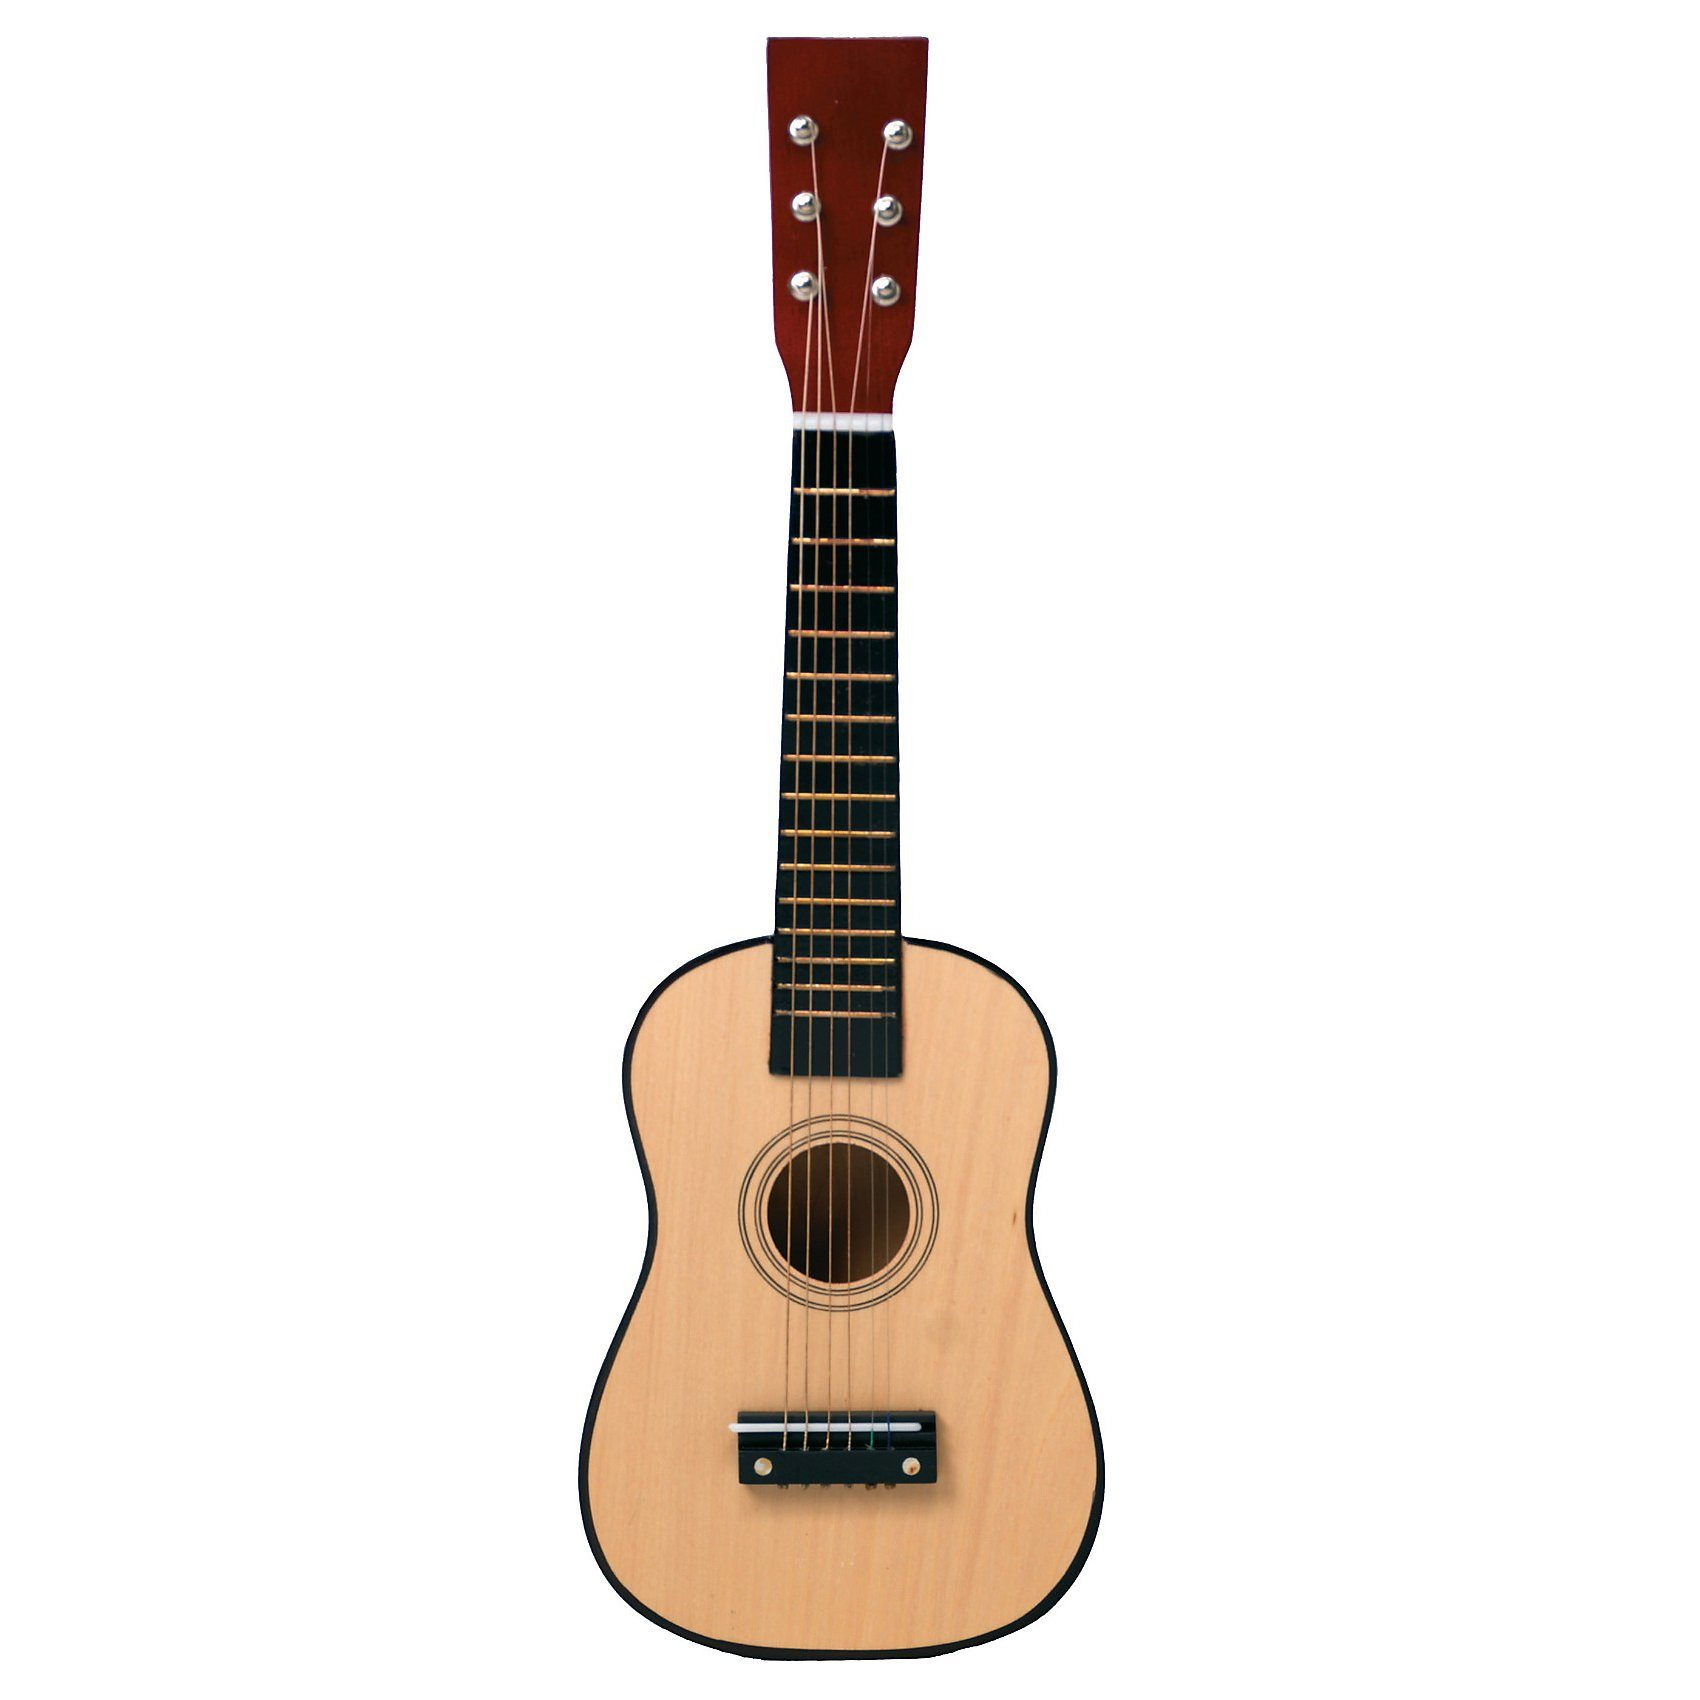 Eitech Gitarre - natur 60 cm, inkl. Gitarrengurt